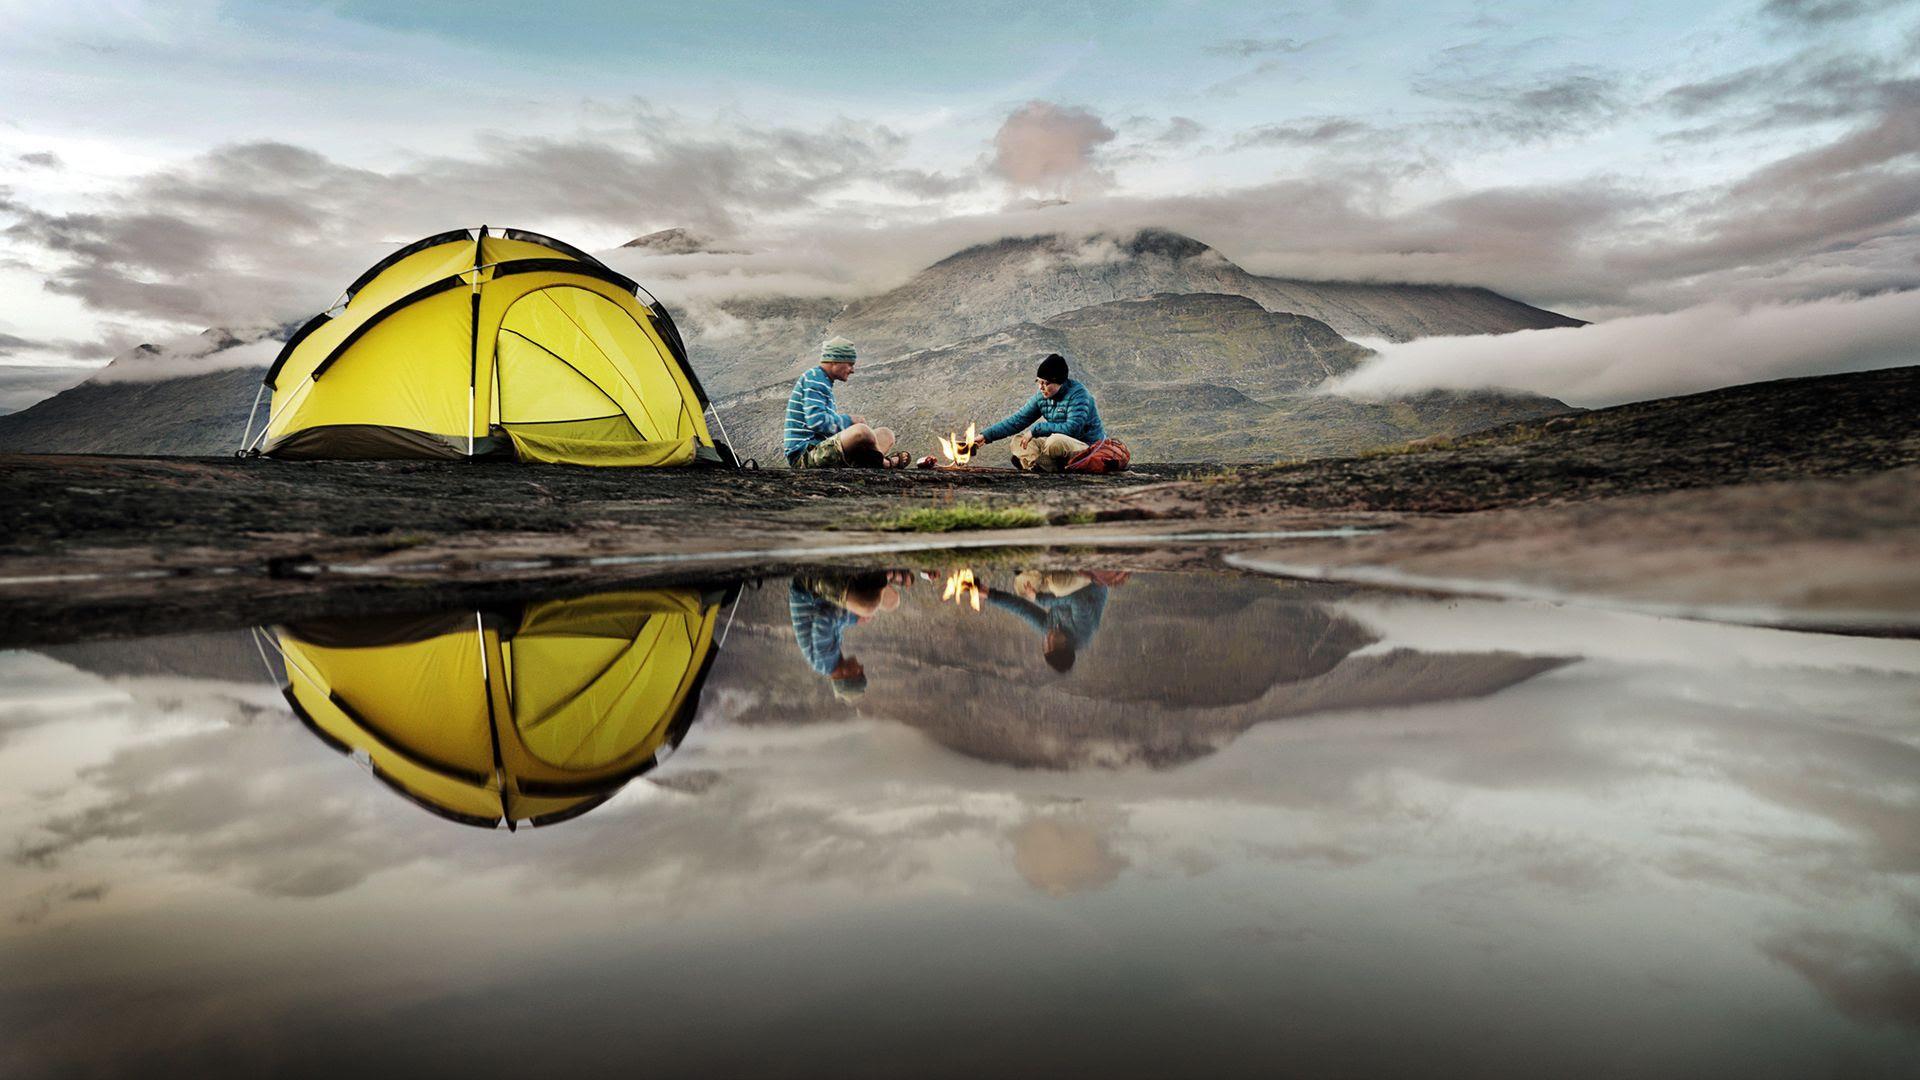 Camping Wallpapers HD | PixelsTalk.Net